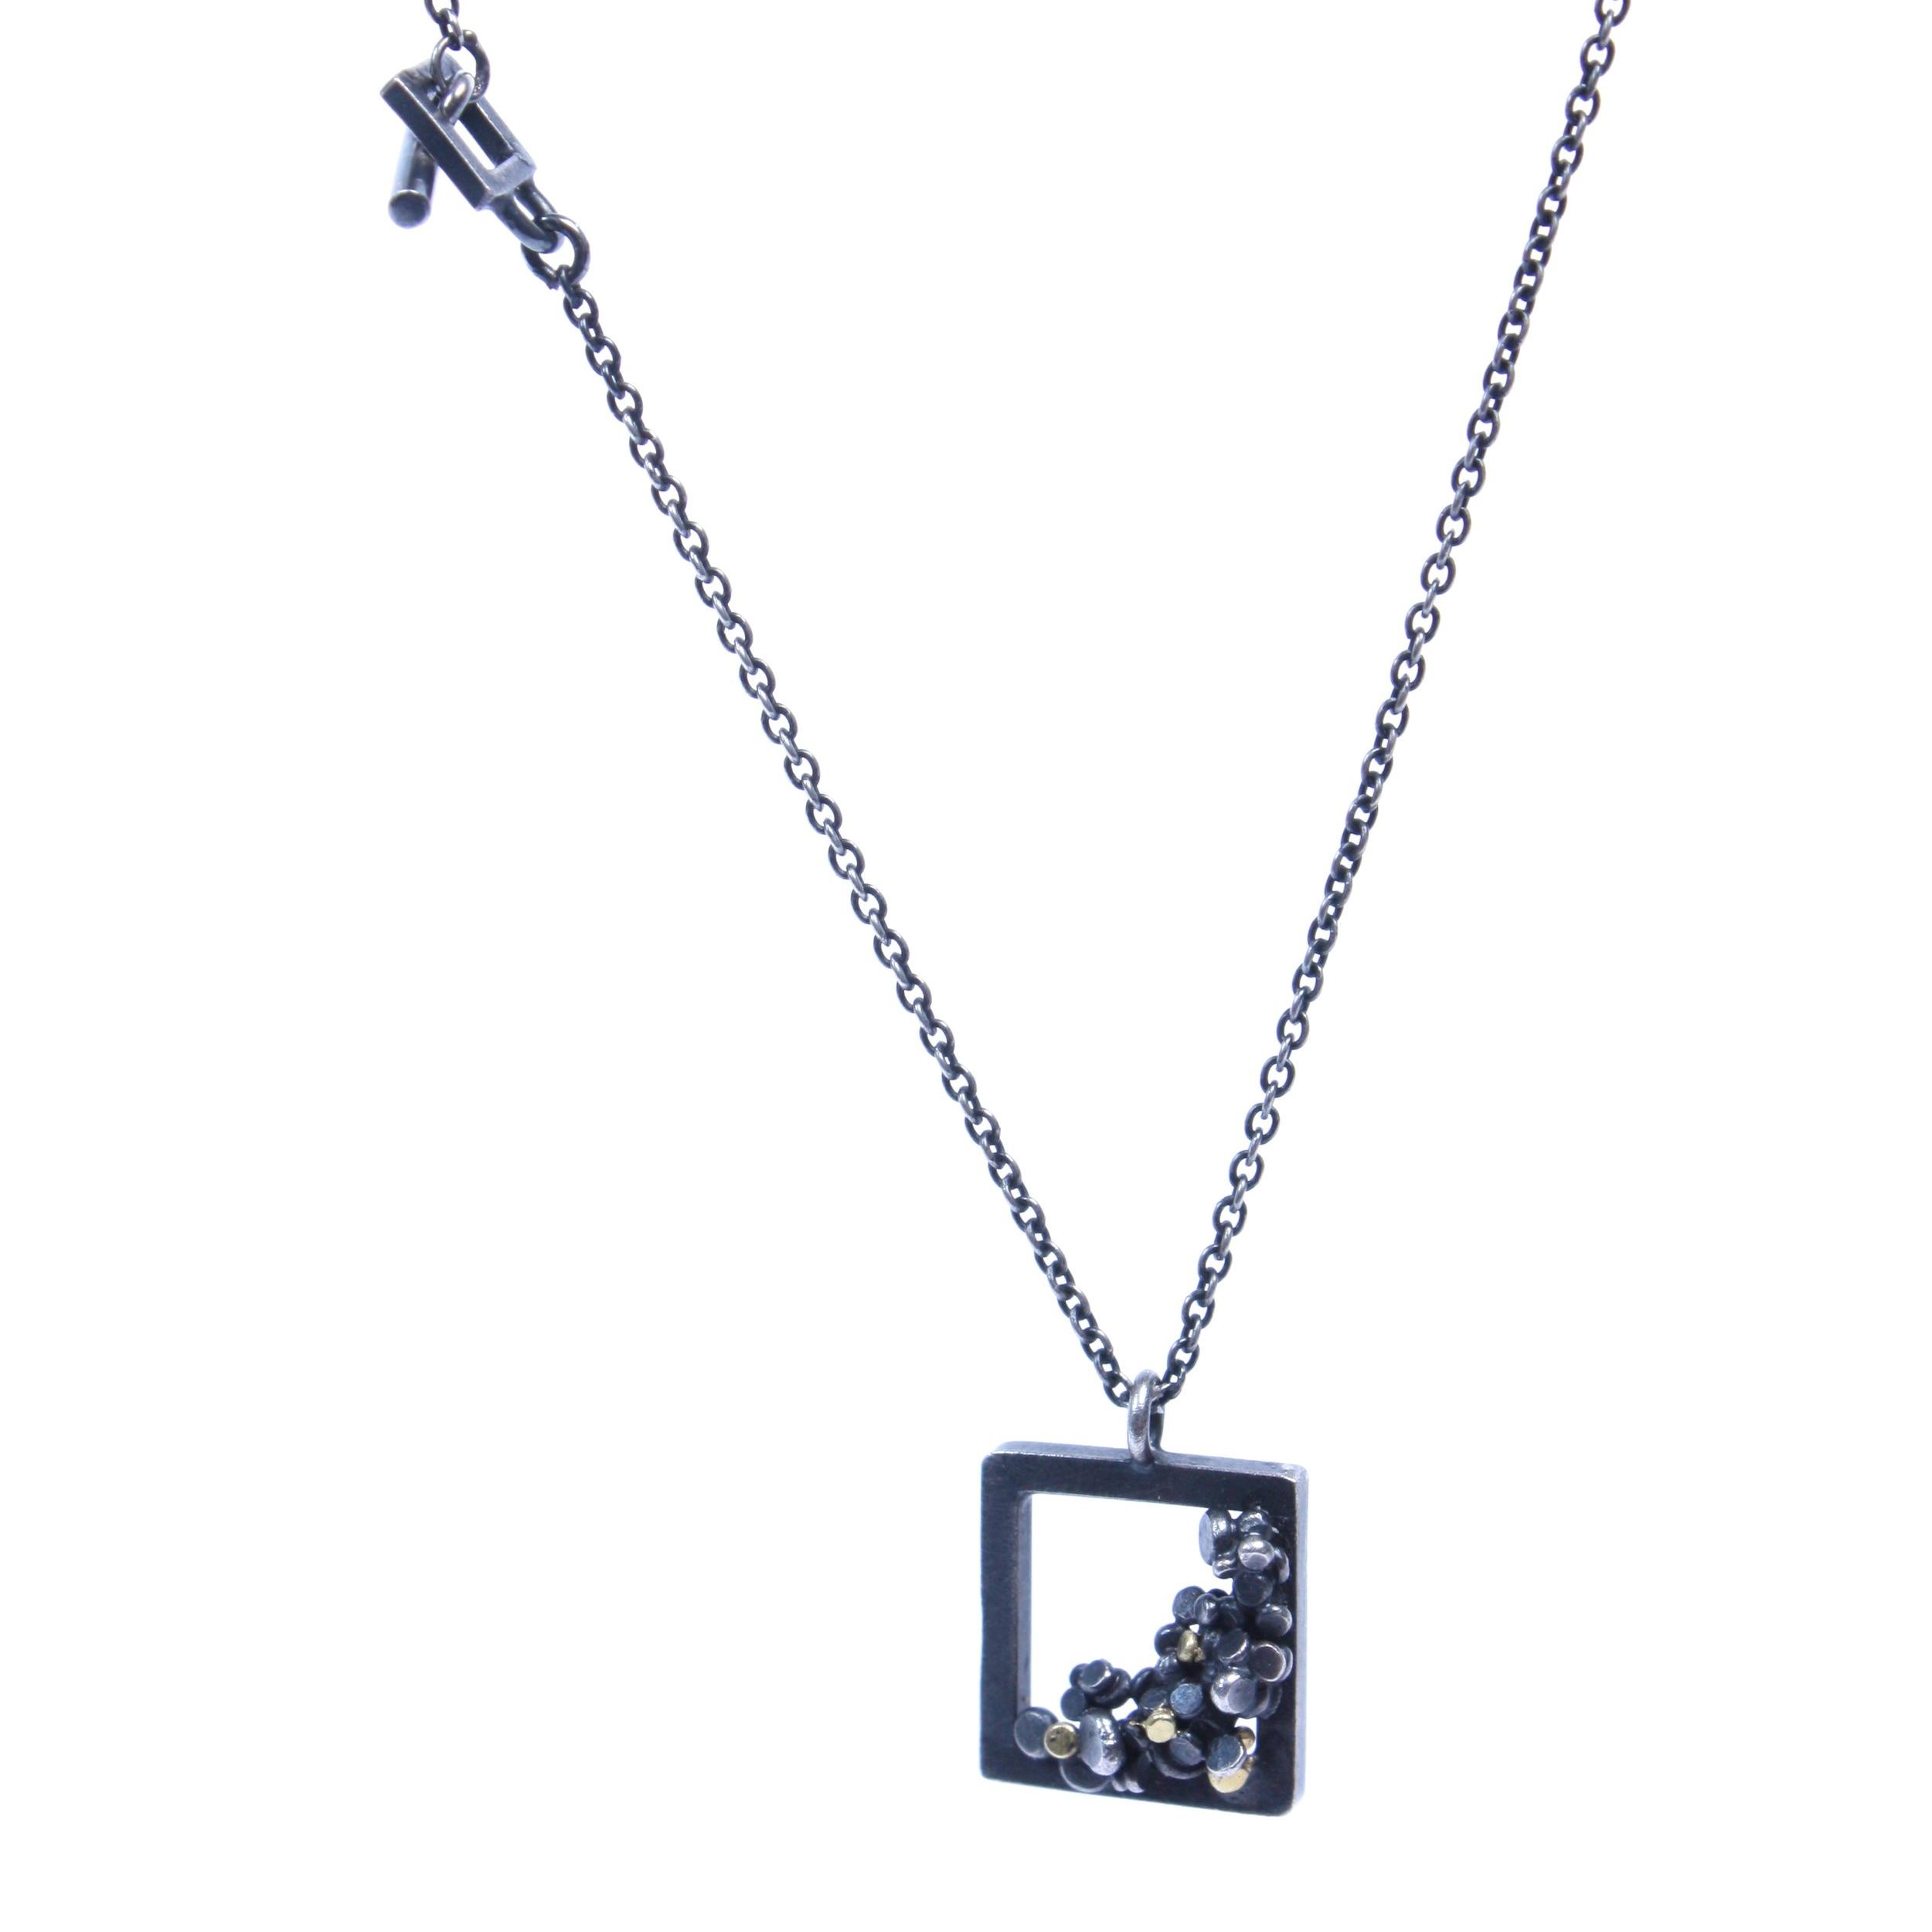 Speckle Square Frame Necklace